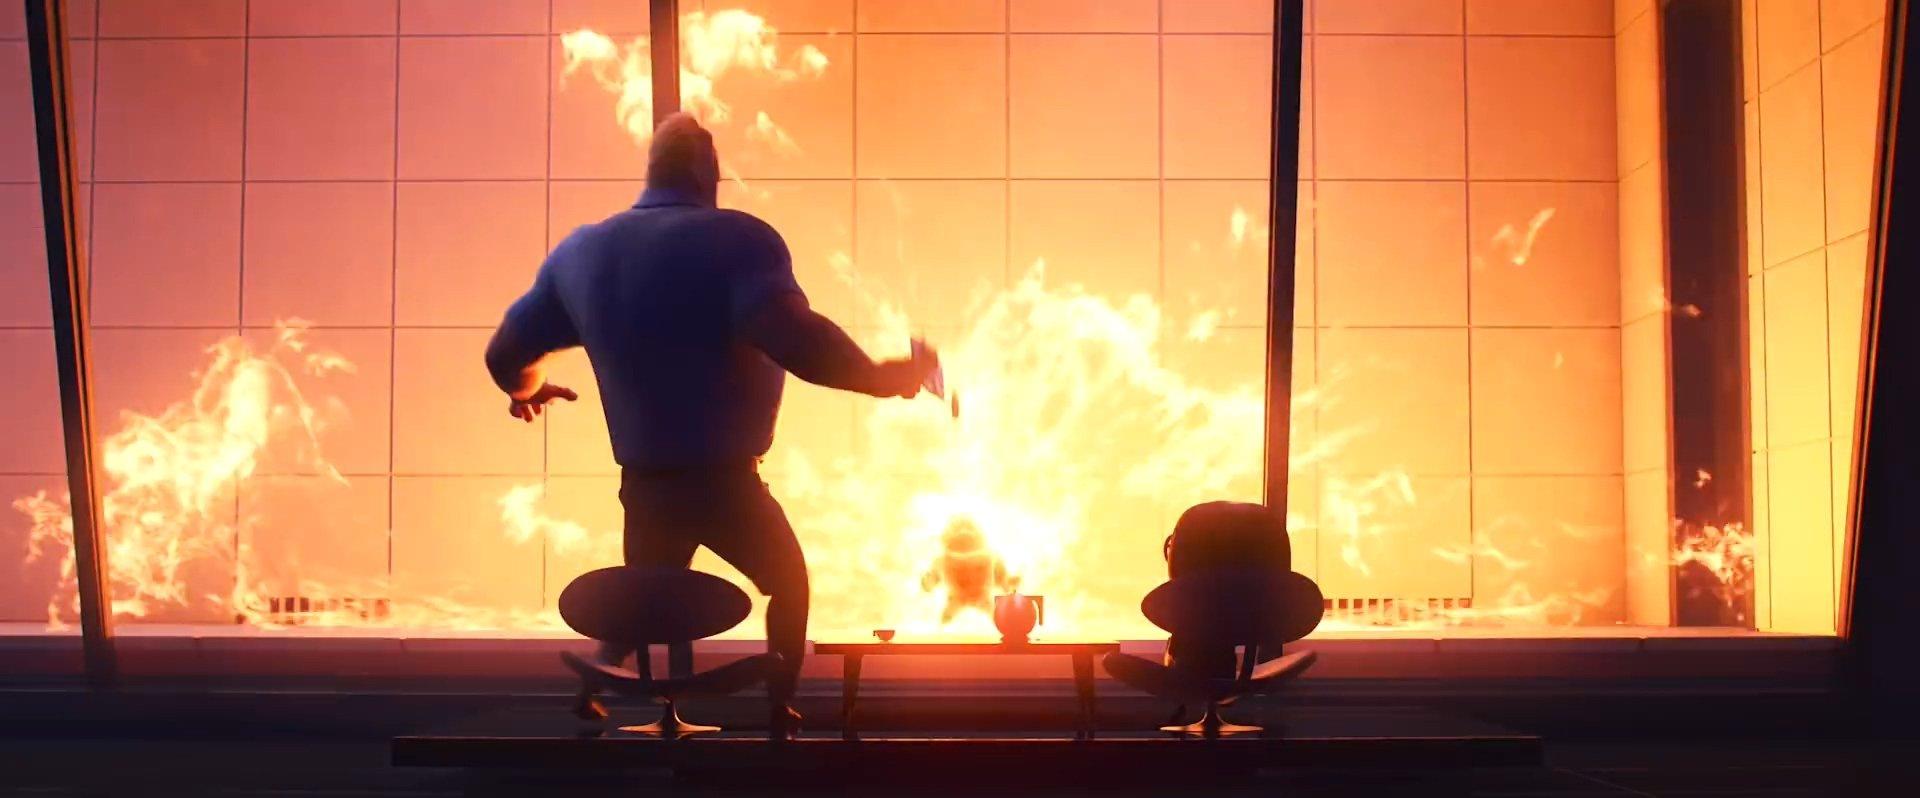 Incredibles 2 Official Trailer_156.115.jpg